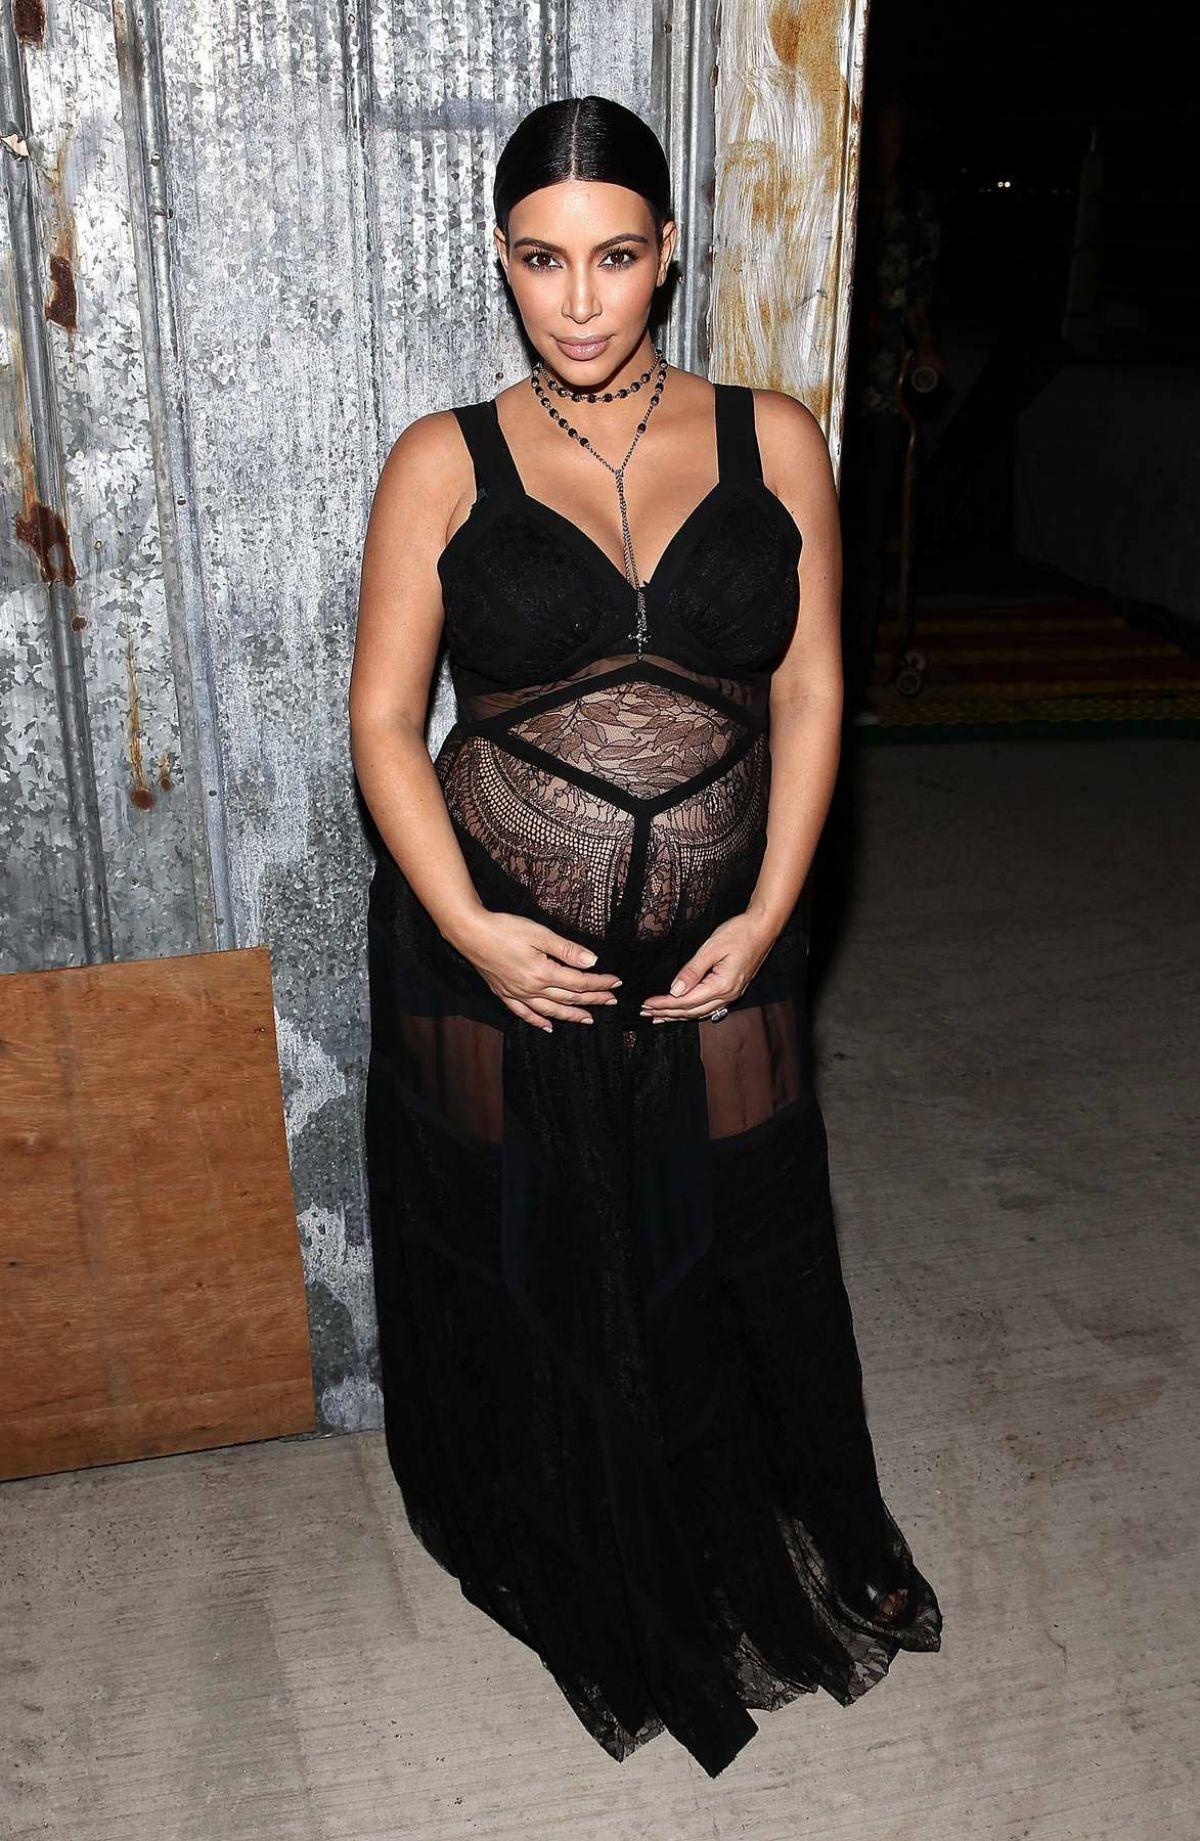 Pregnant KIM KARDASHIAN at Givenchy Fashion Show in New York 09/11